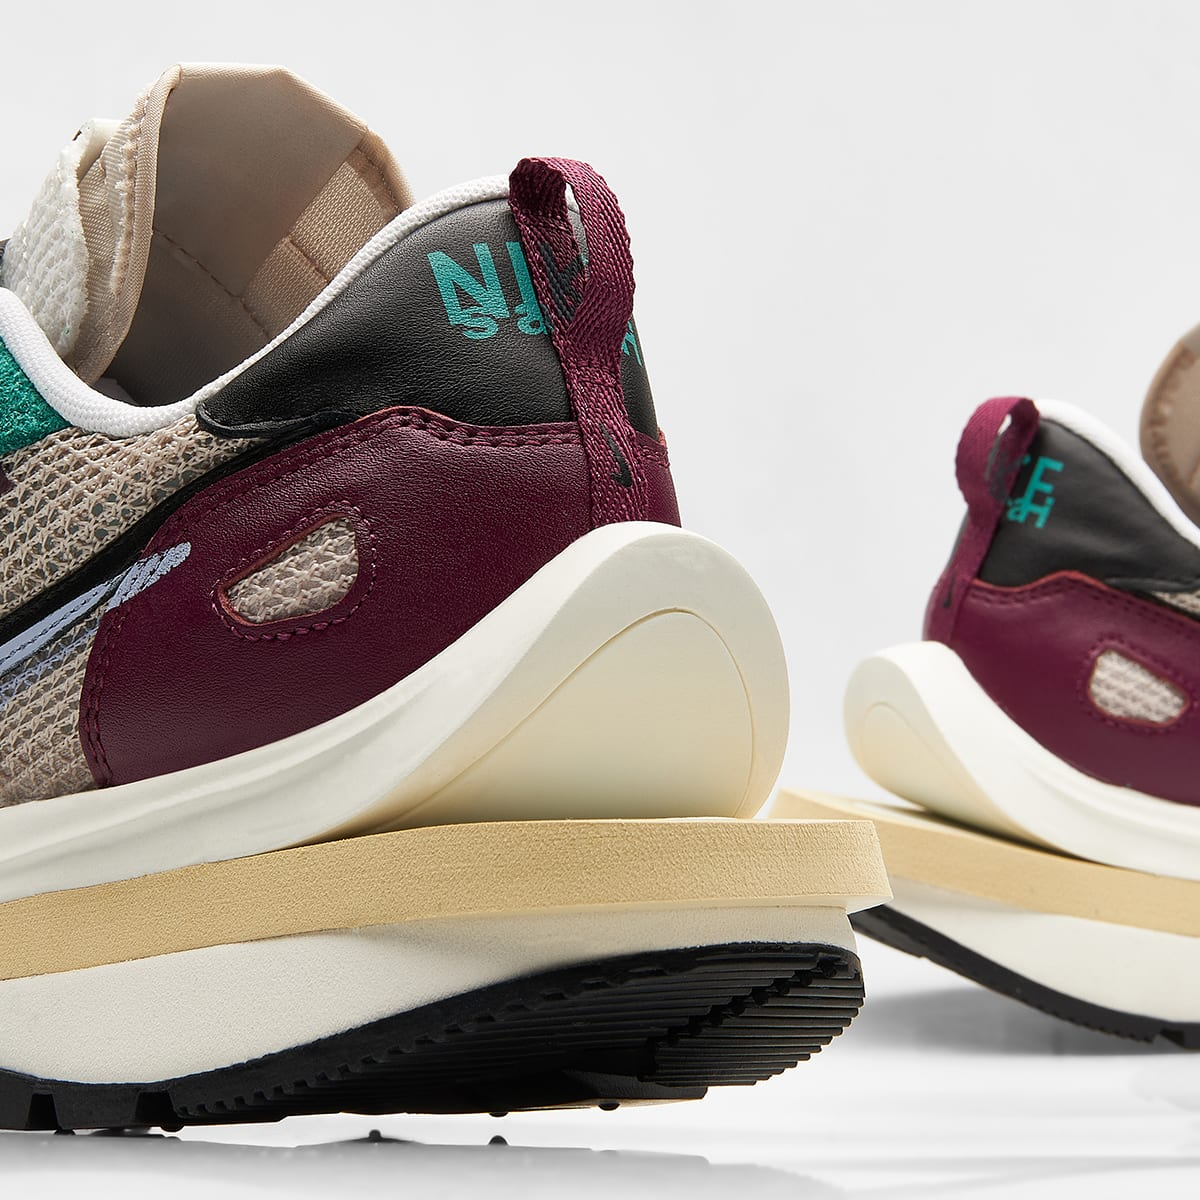 Nike x Sacai Vaporwaffle - DD3035-200